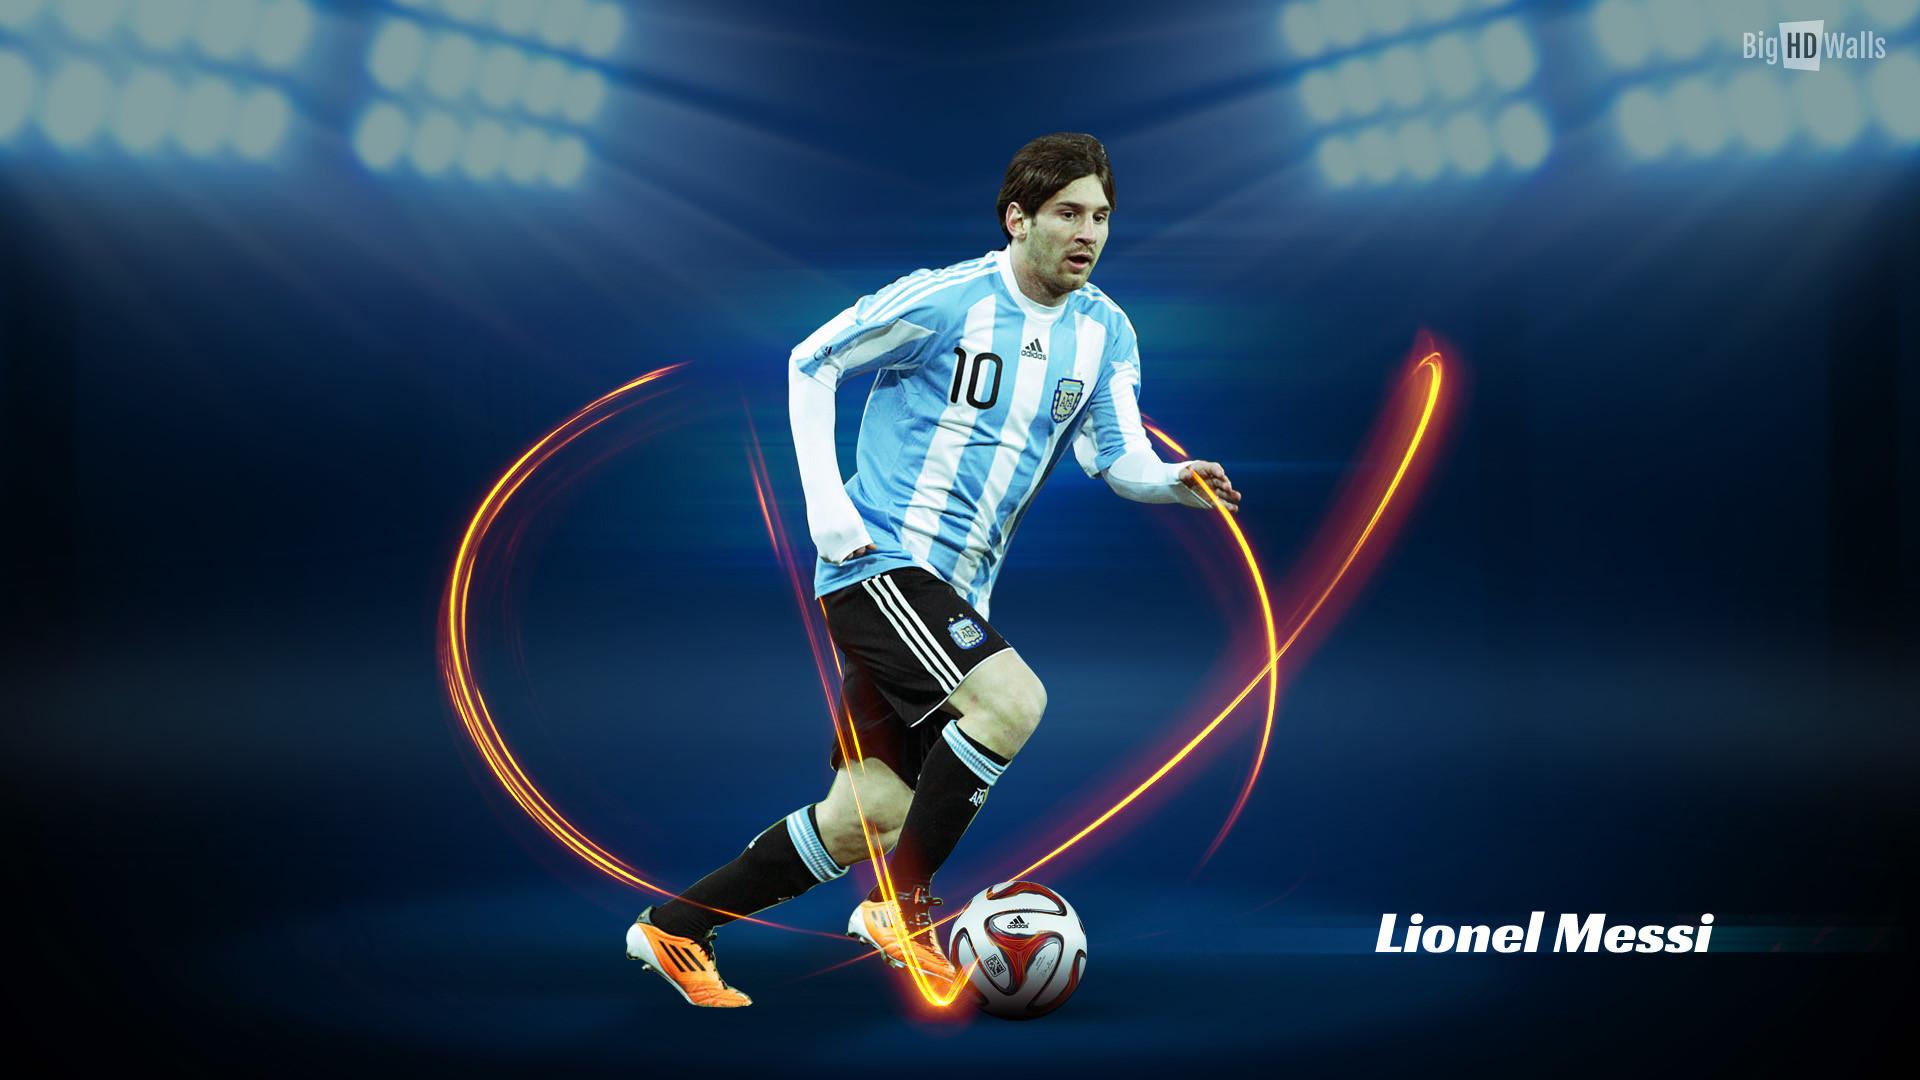 Lionel Messi Wallpaper 2018 74 Images